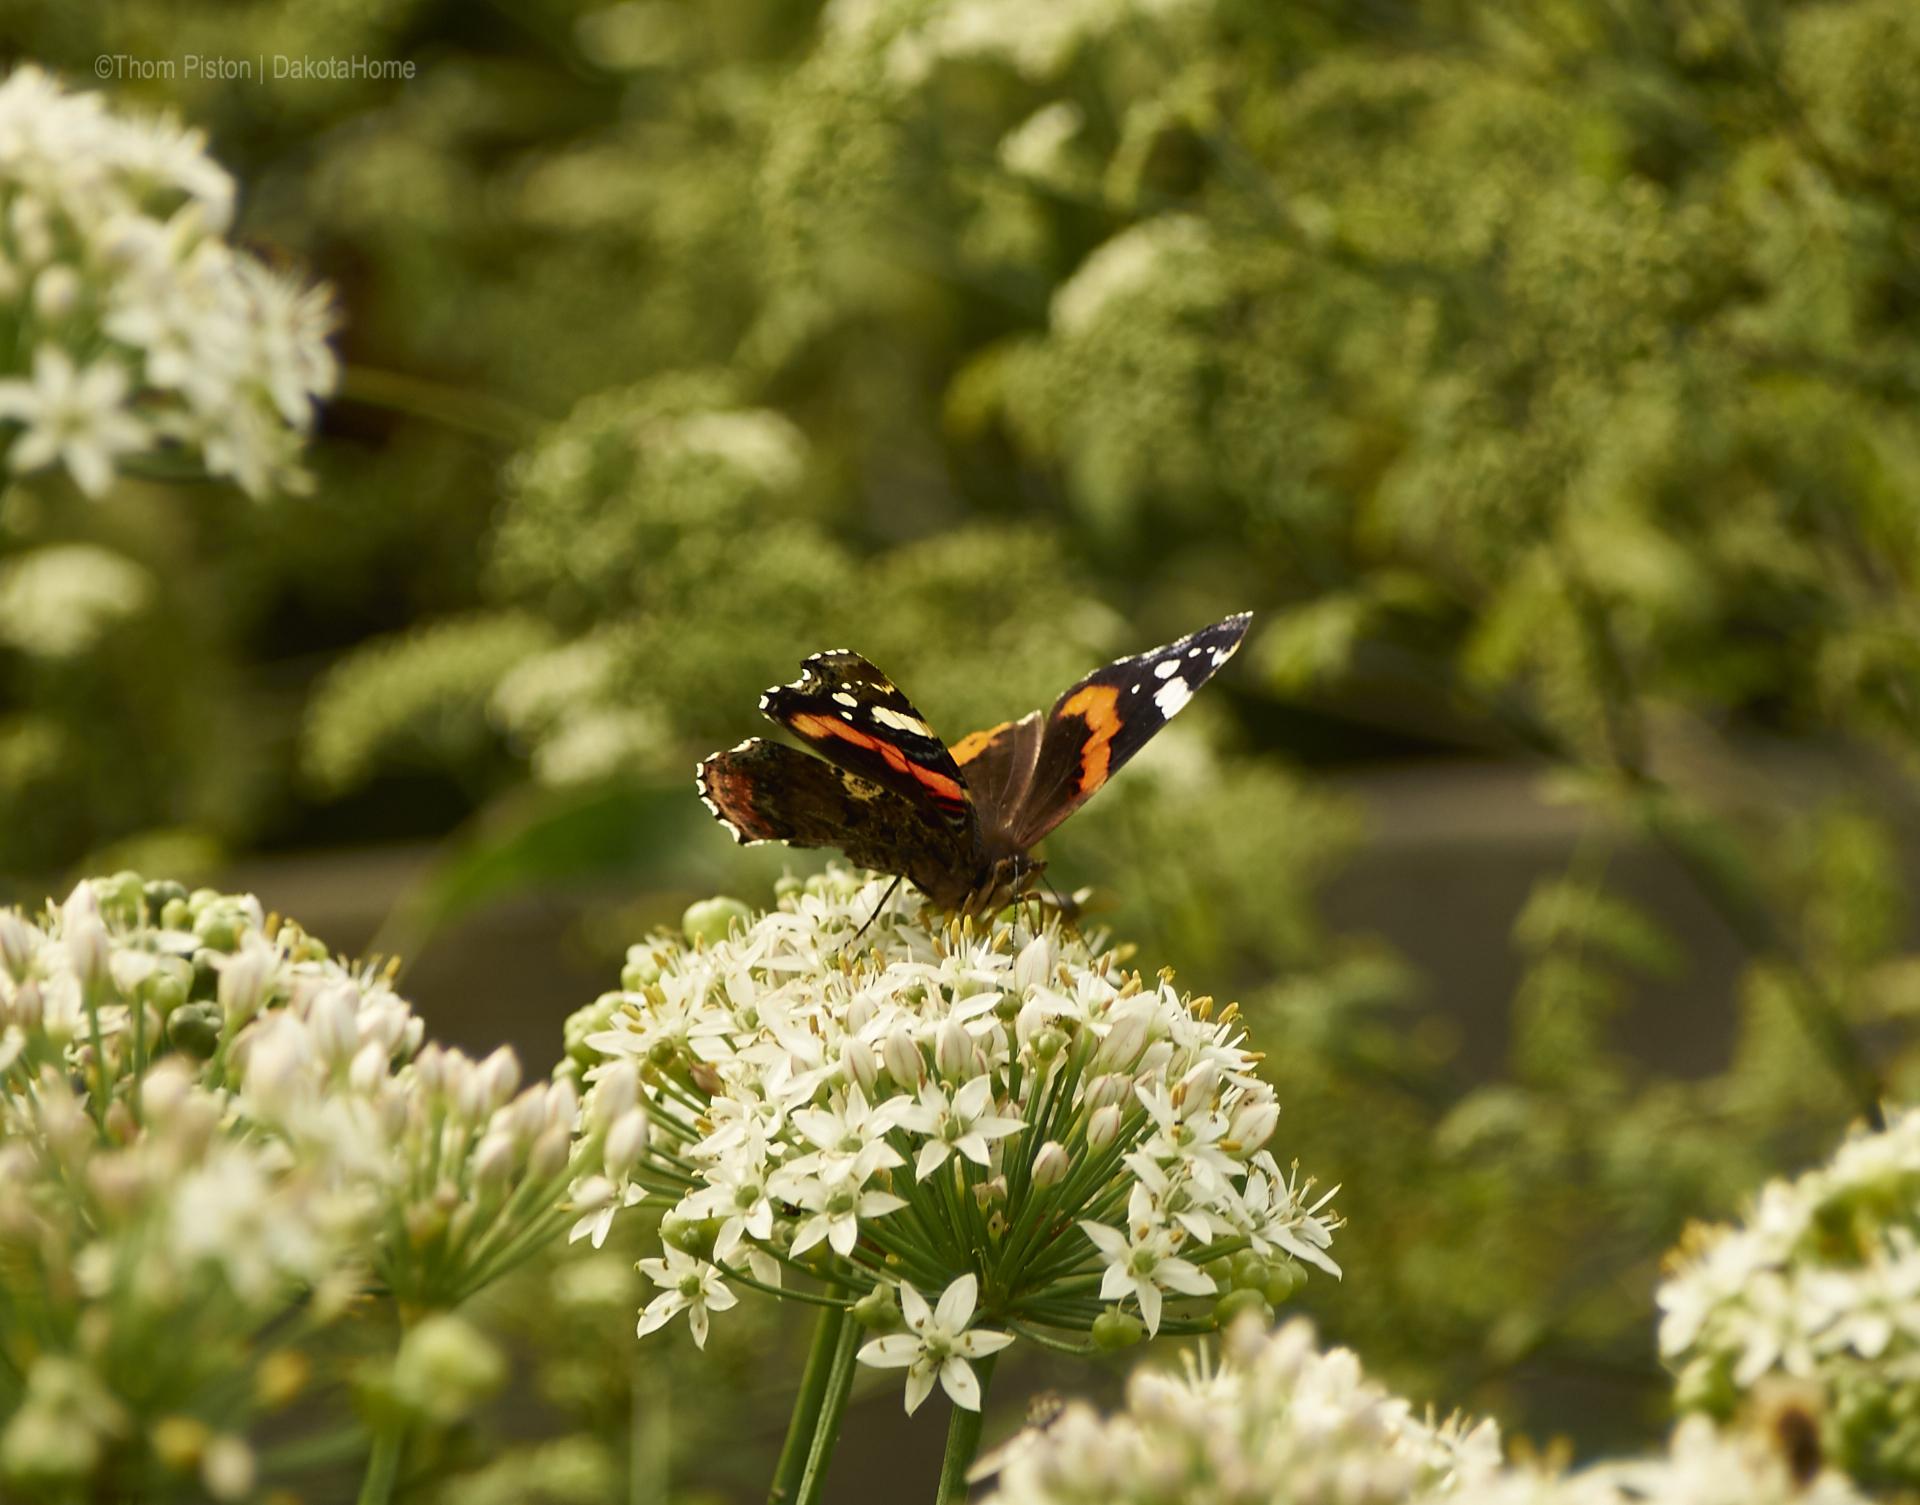 Schmetterling at Dakota Home